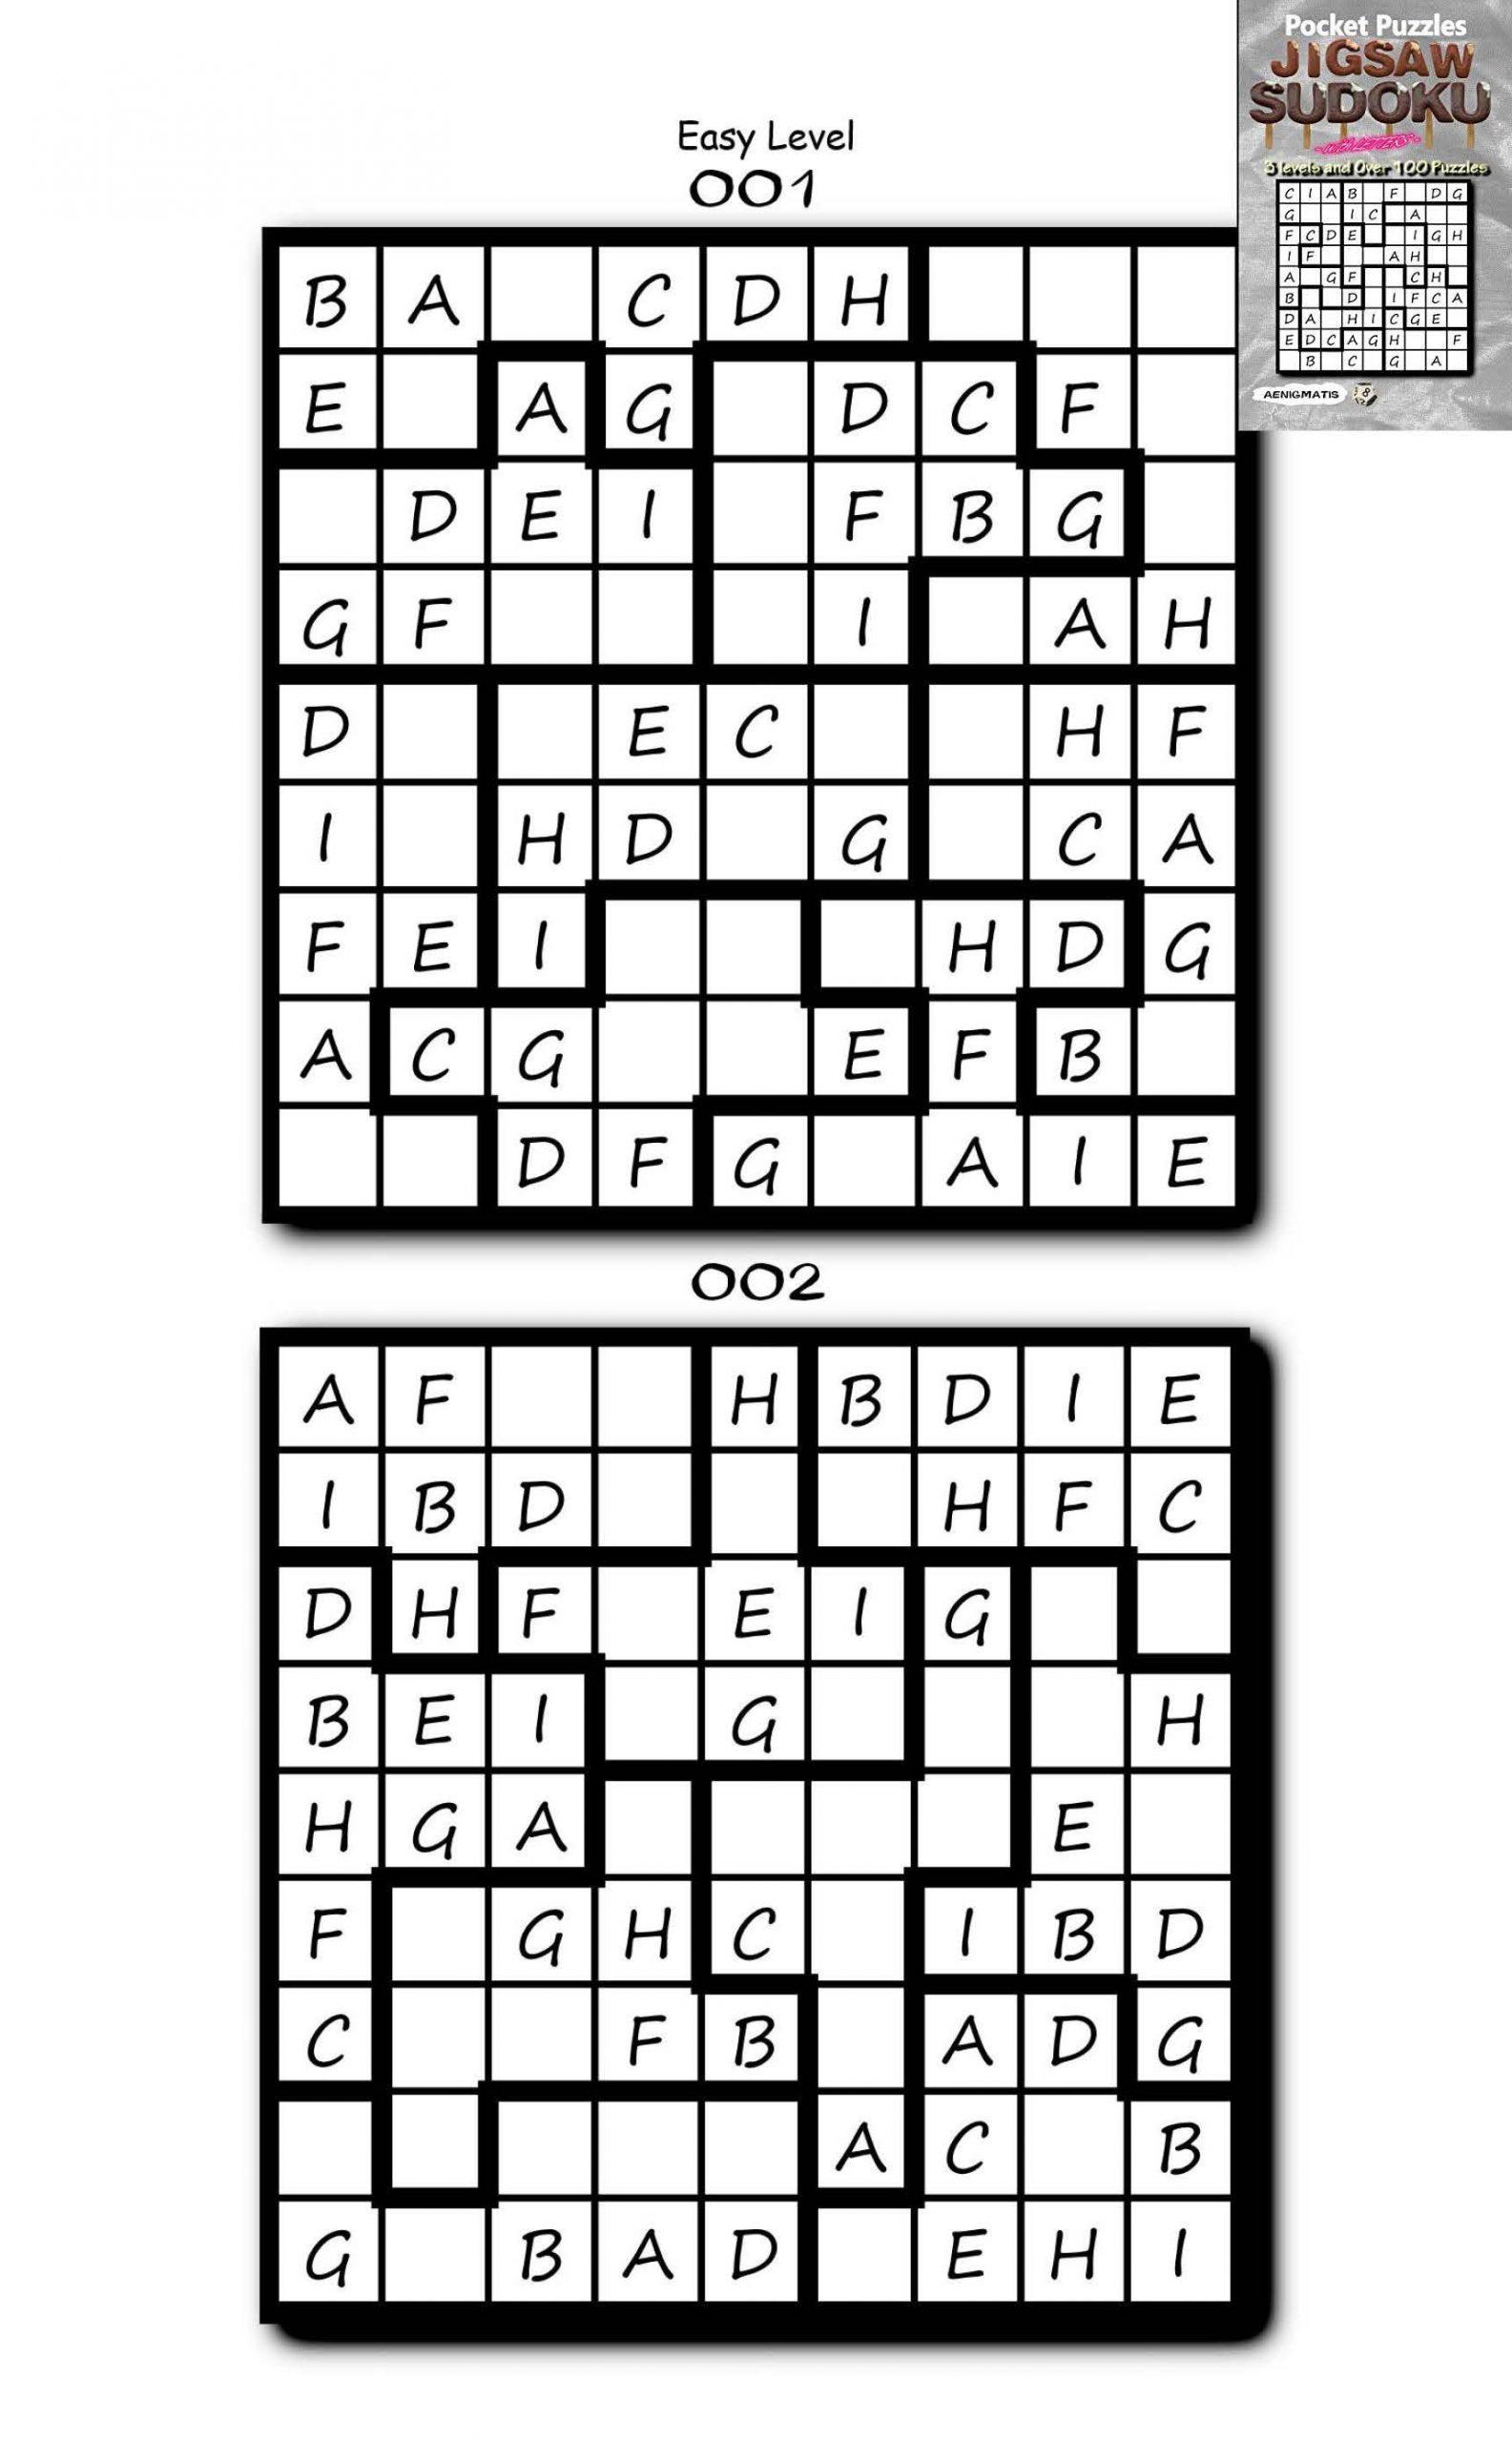 Printable Jigsaw Sudoku Puzzles